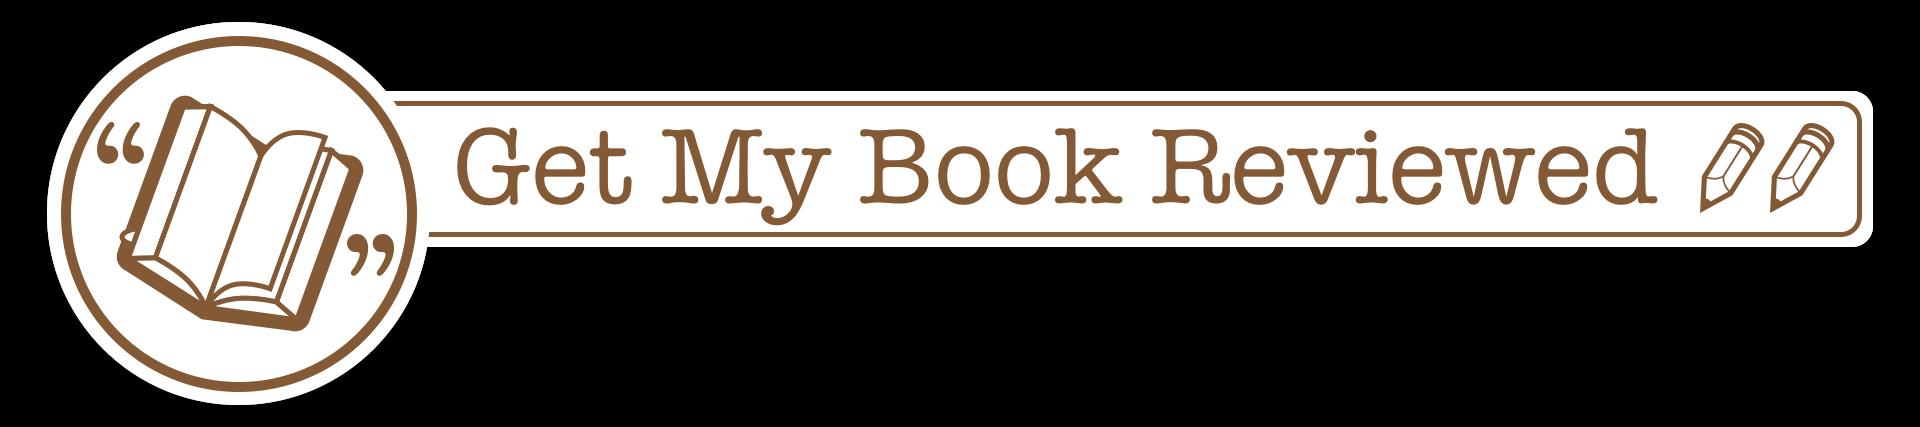 Get My Book Reviewed